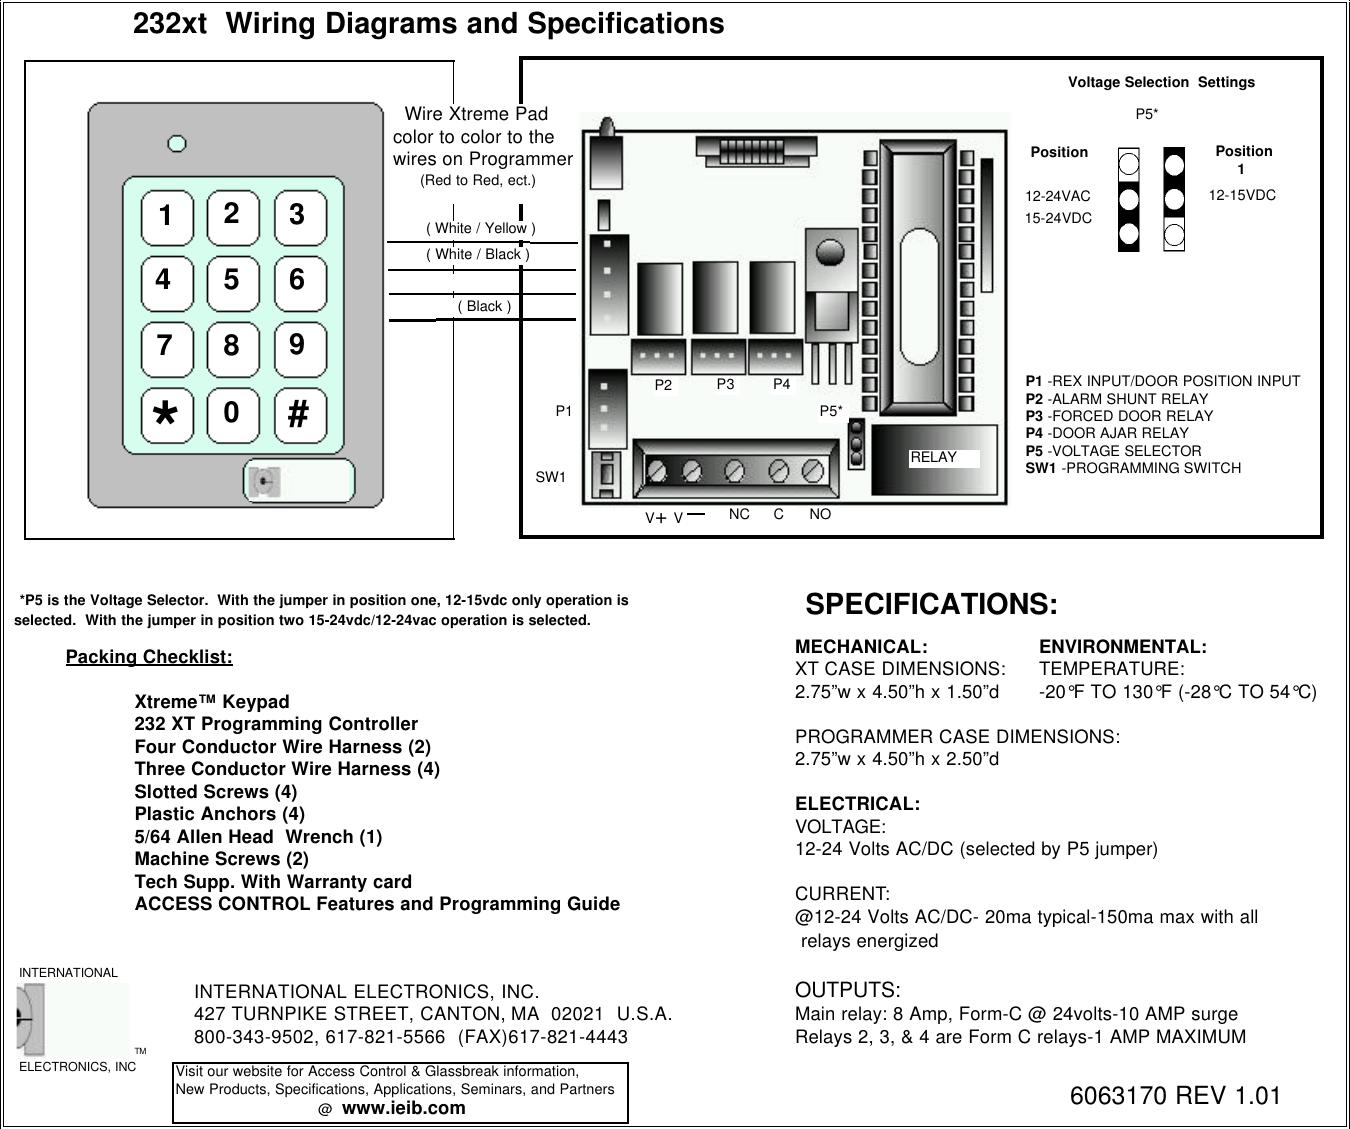 Linear 232Xt Owners Manual 232XTrev1_01 on dsc keypad wiring, iei keypads 212i manual, iei security keypads for doors, linear keypad wiring, alarm lock keypad wiring,